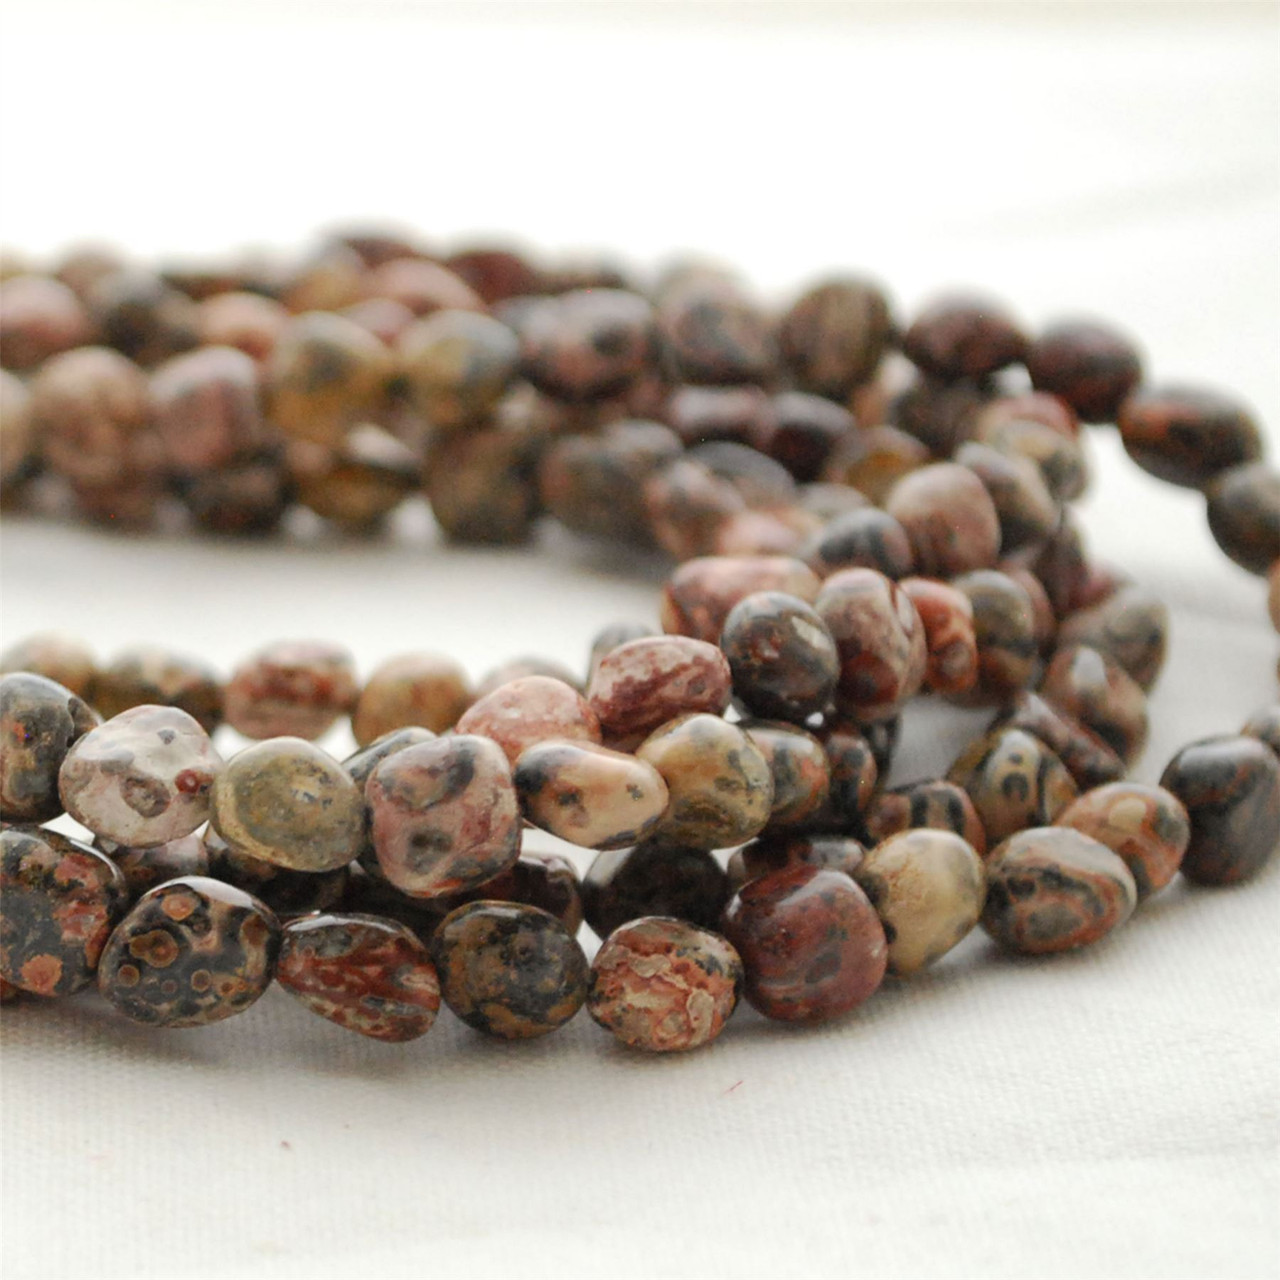 Oval Leopard Jasper Gemstone Beads 10 x 14mm 3 Strands